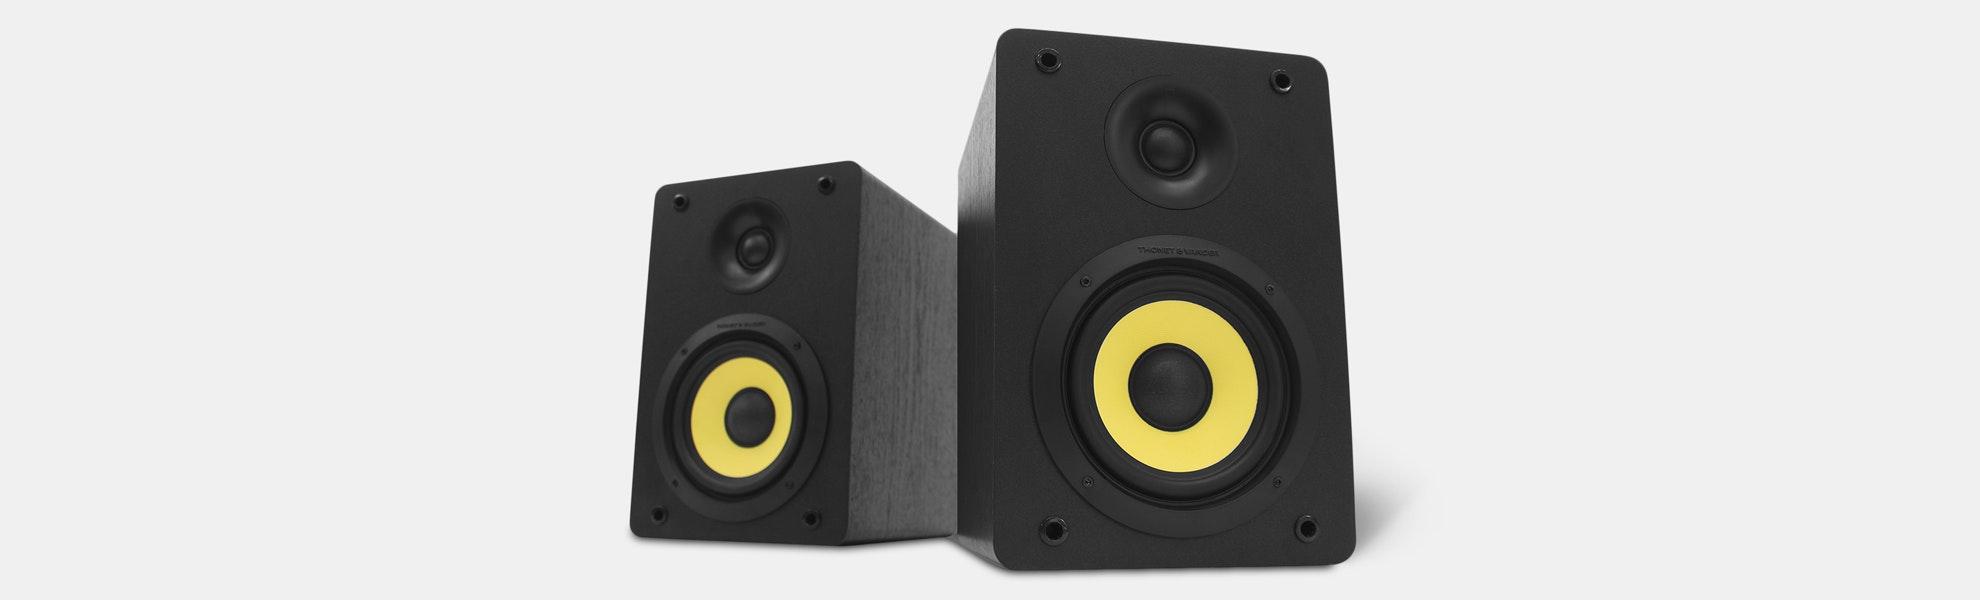 Thonet & Vander Kurbis BT Bluetooth Speakers